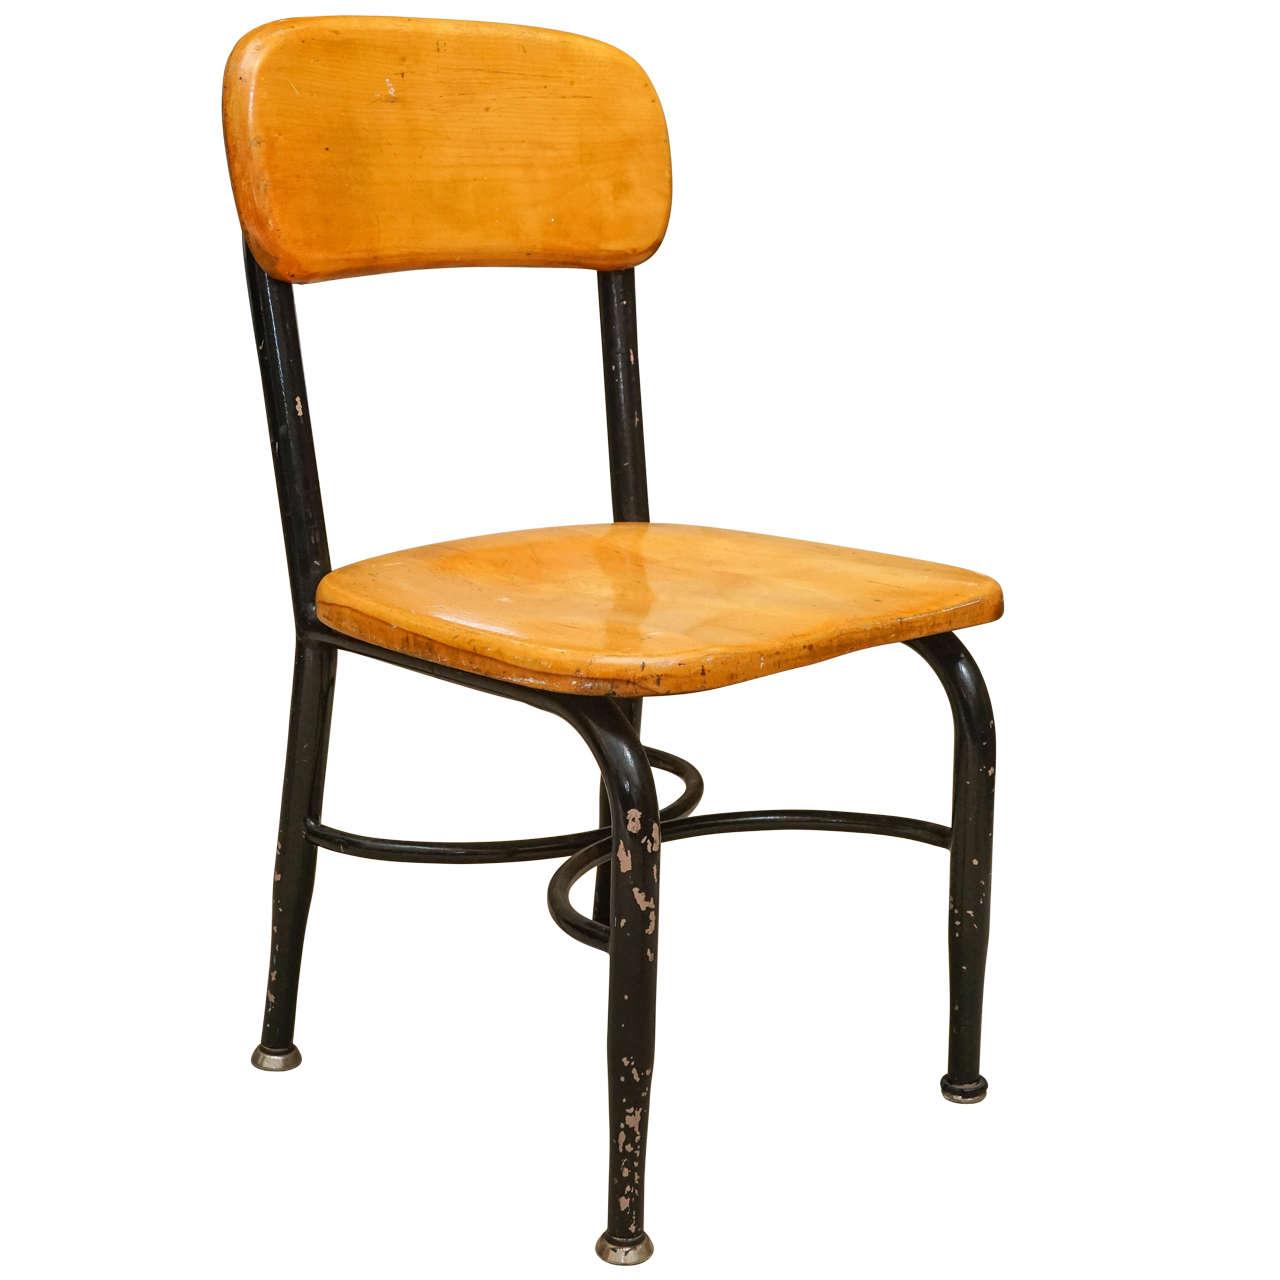 heywood wakefield chairs danish modern dining chair child 39s at 1stdibs